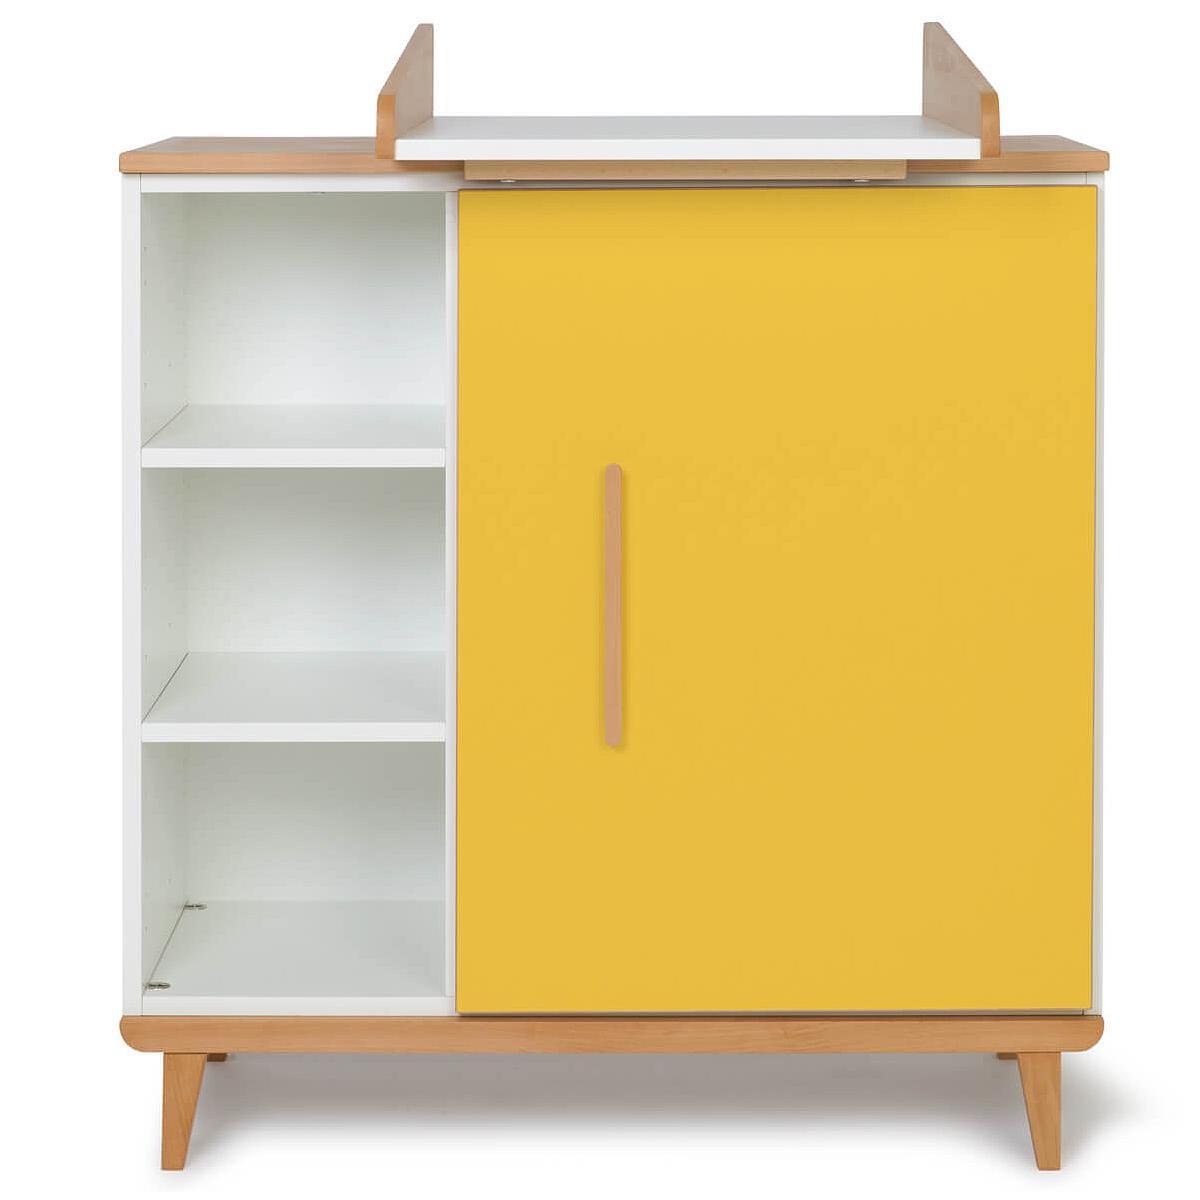 Wookids - Commode à langer 1 porte NADO yellow